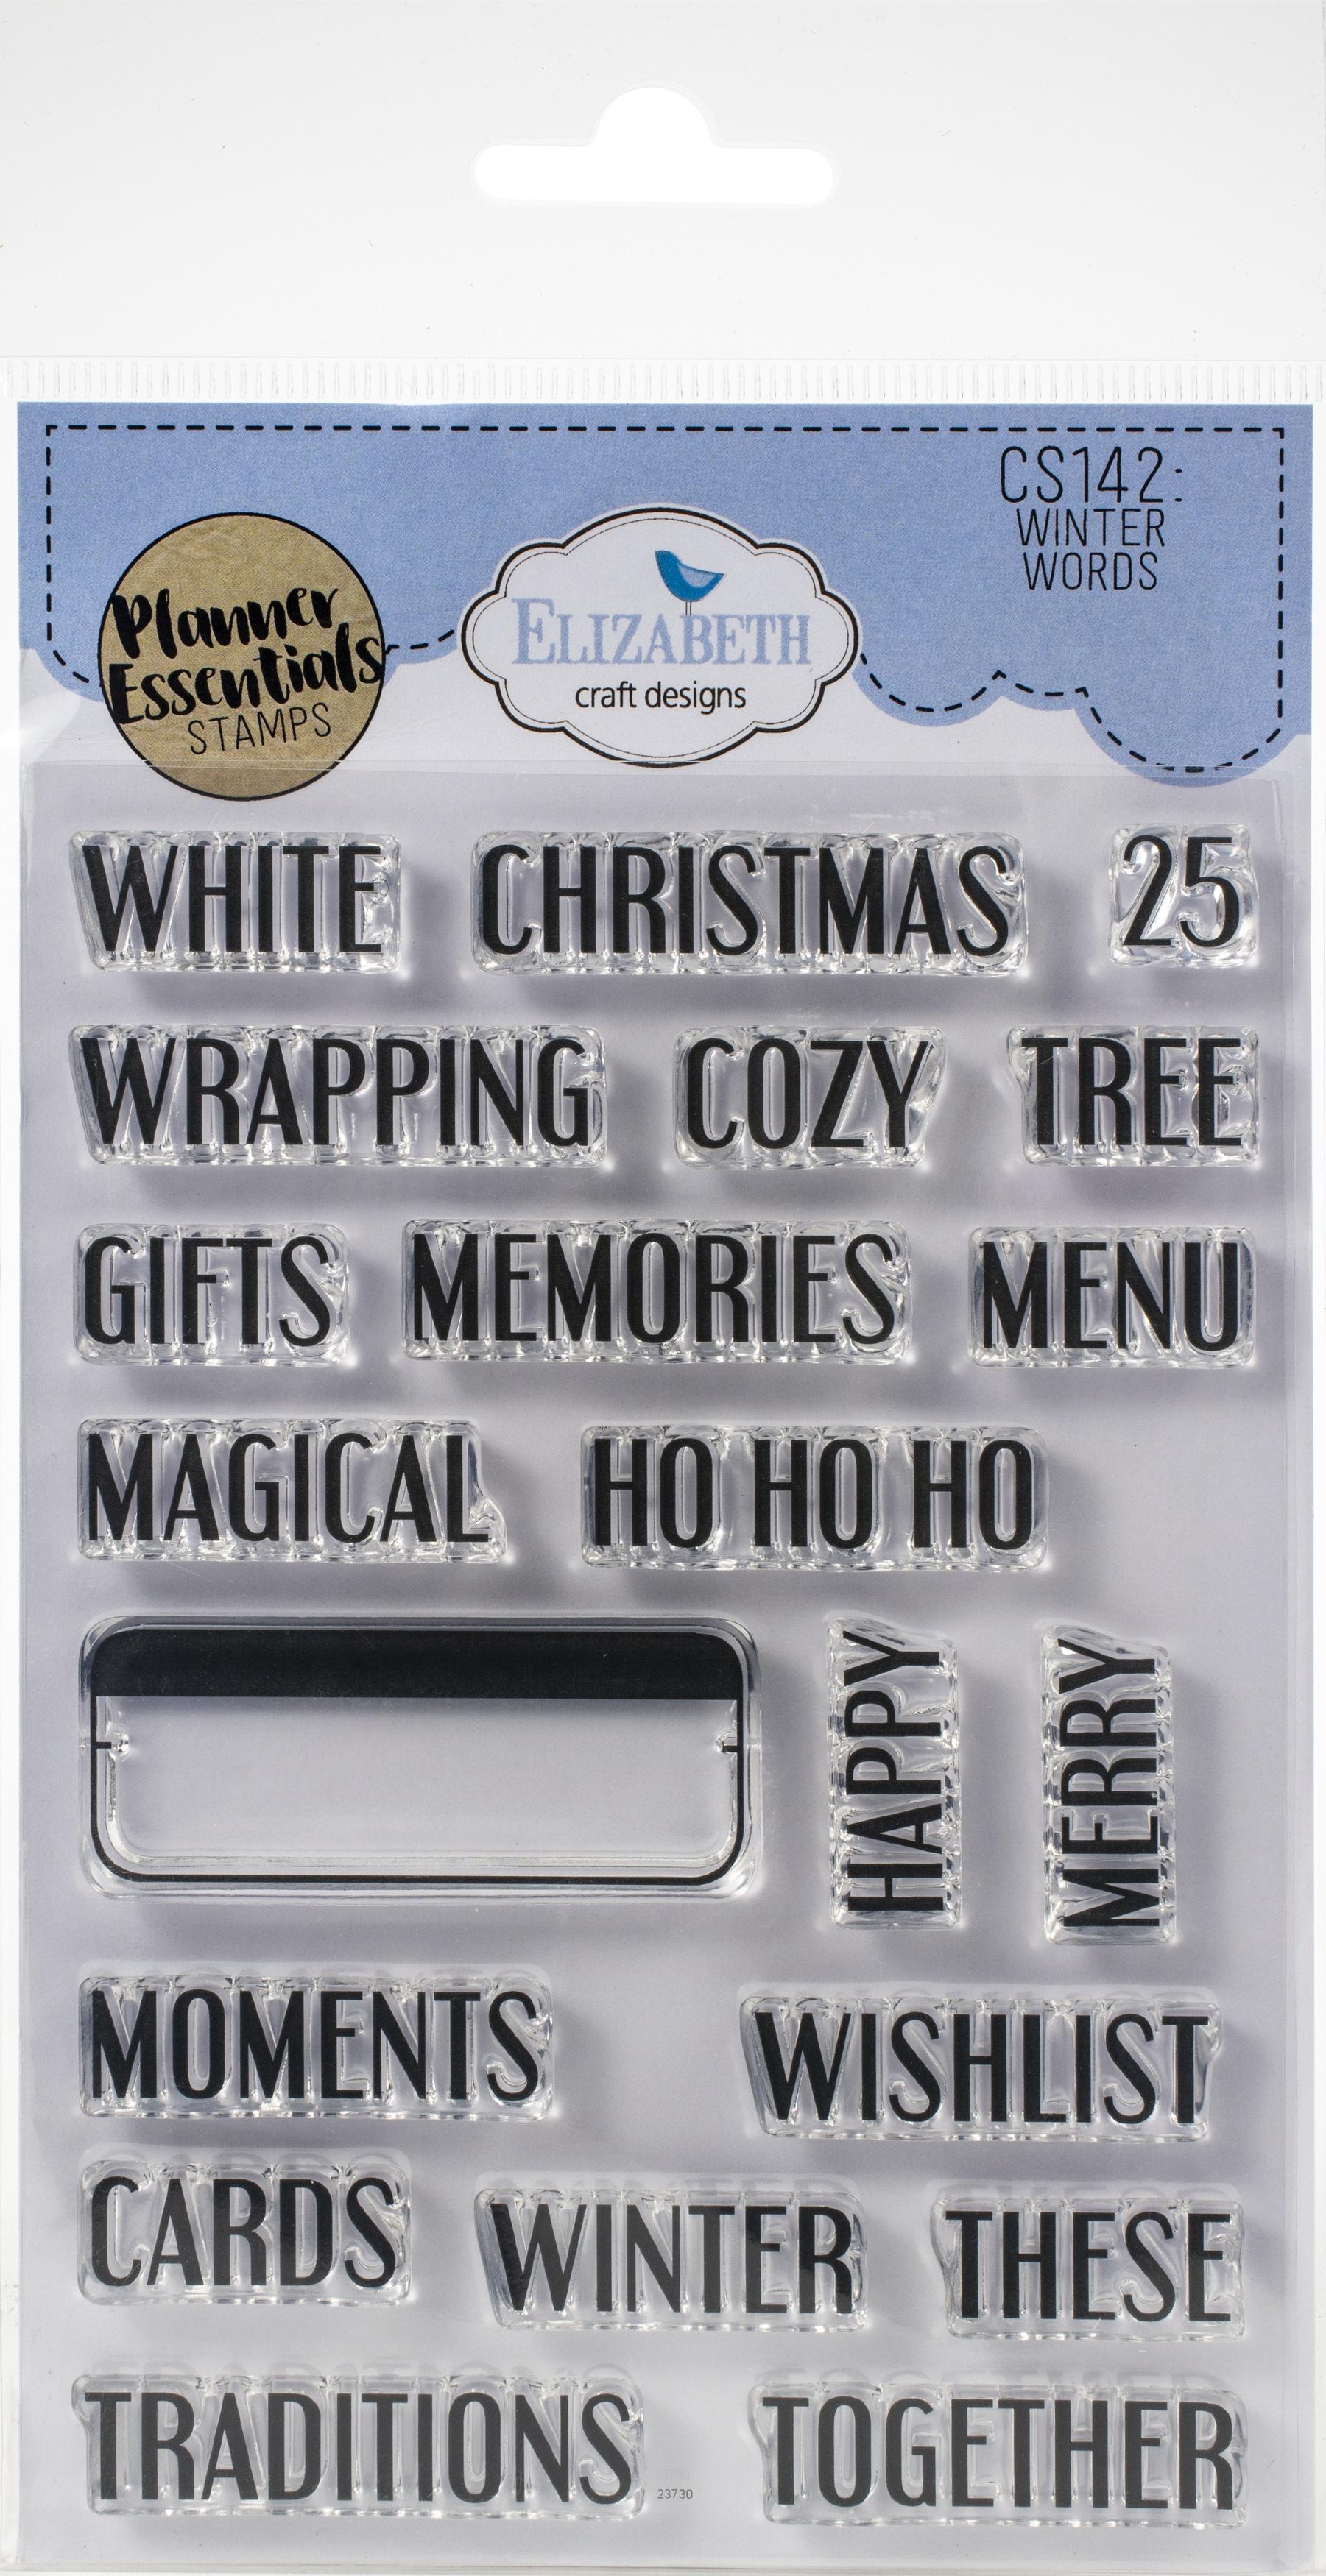 EC - Winter Words Stamp Set